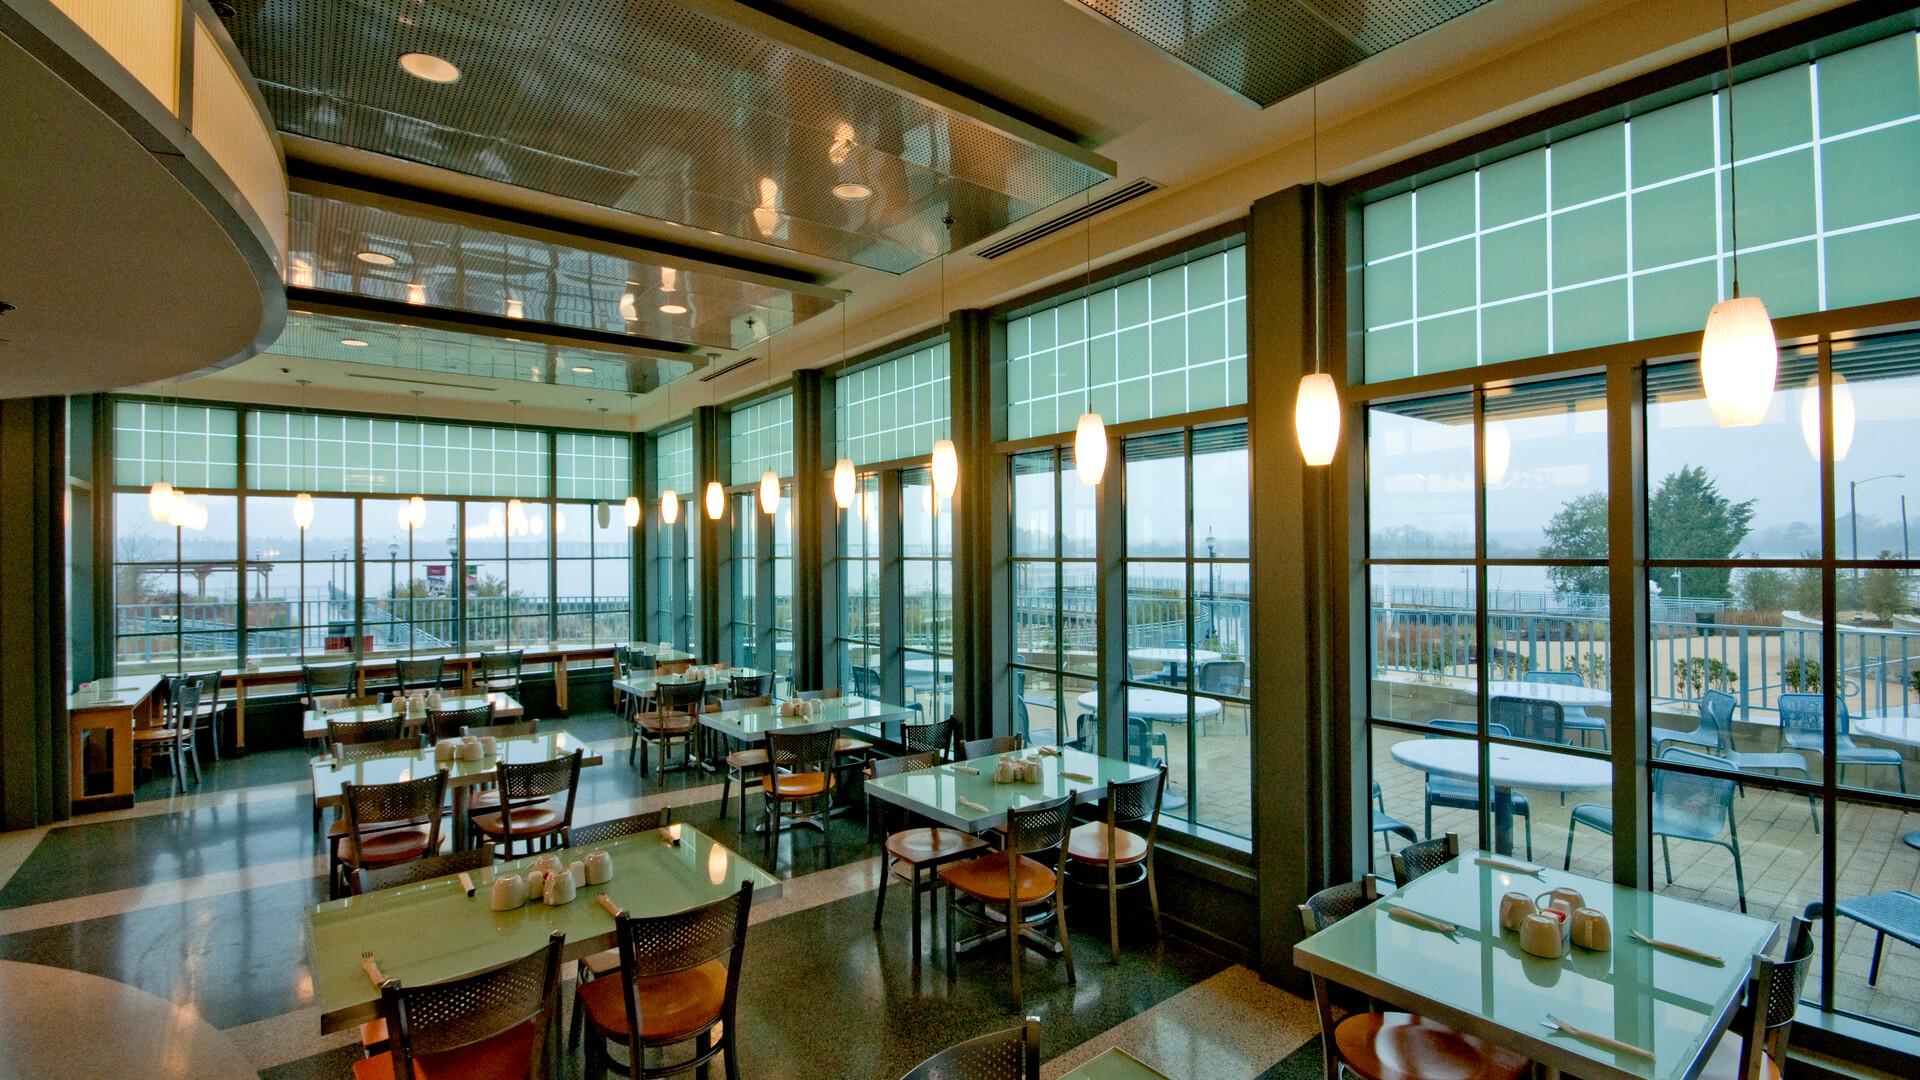 Featured products: Rockfon® Planostile™ Snap-in Metal Panel Ceiling System - Rockfon® Infinity™ Standard Perimeter Trim